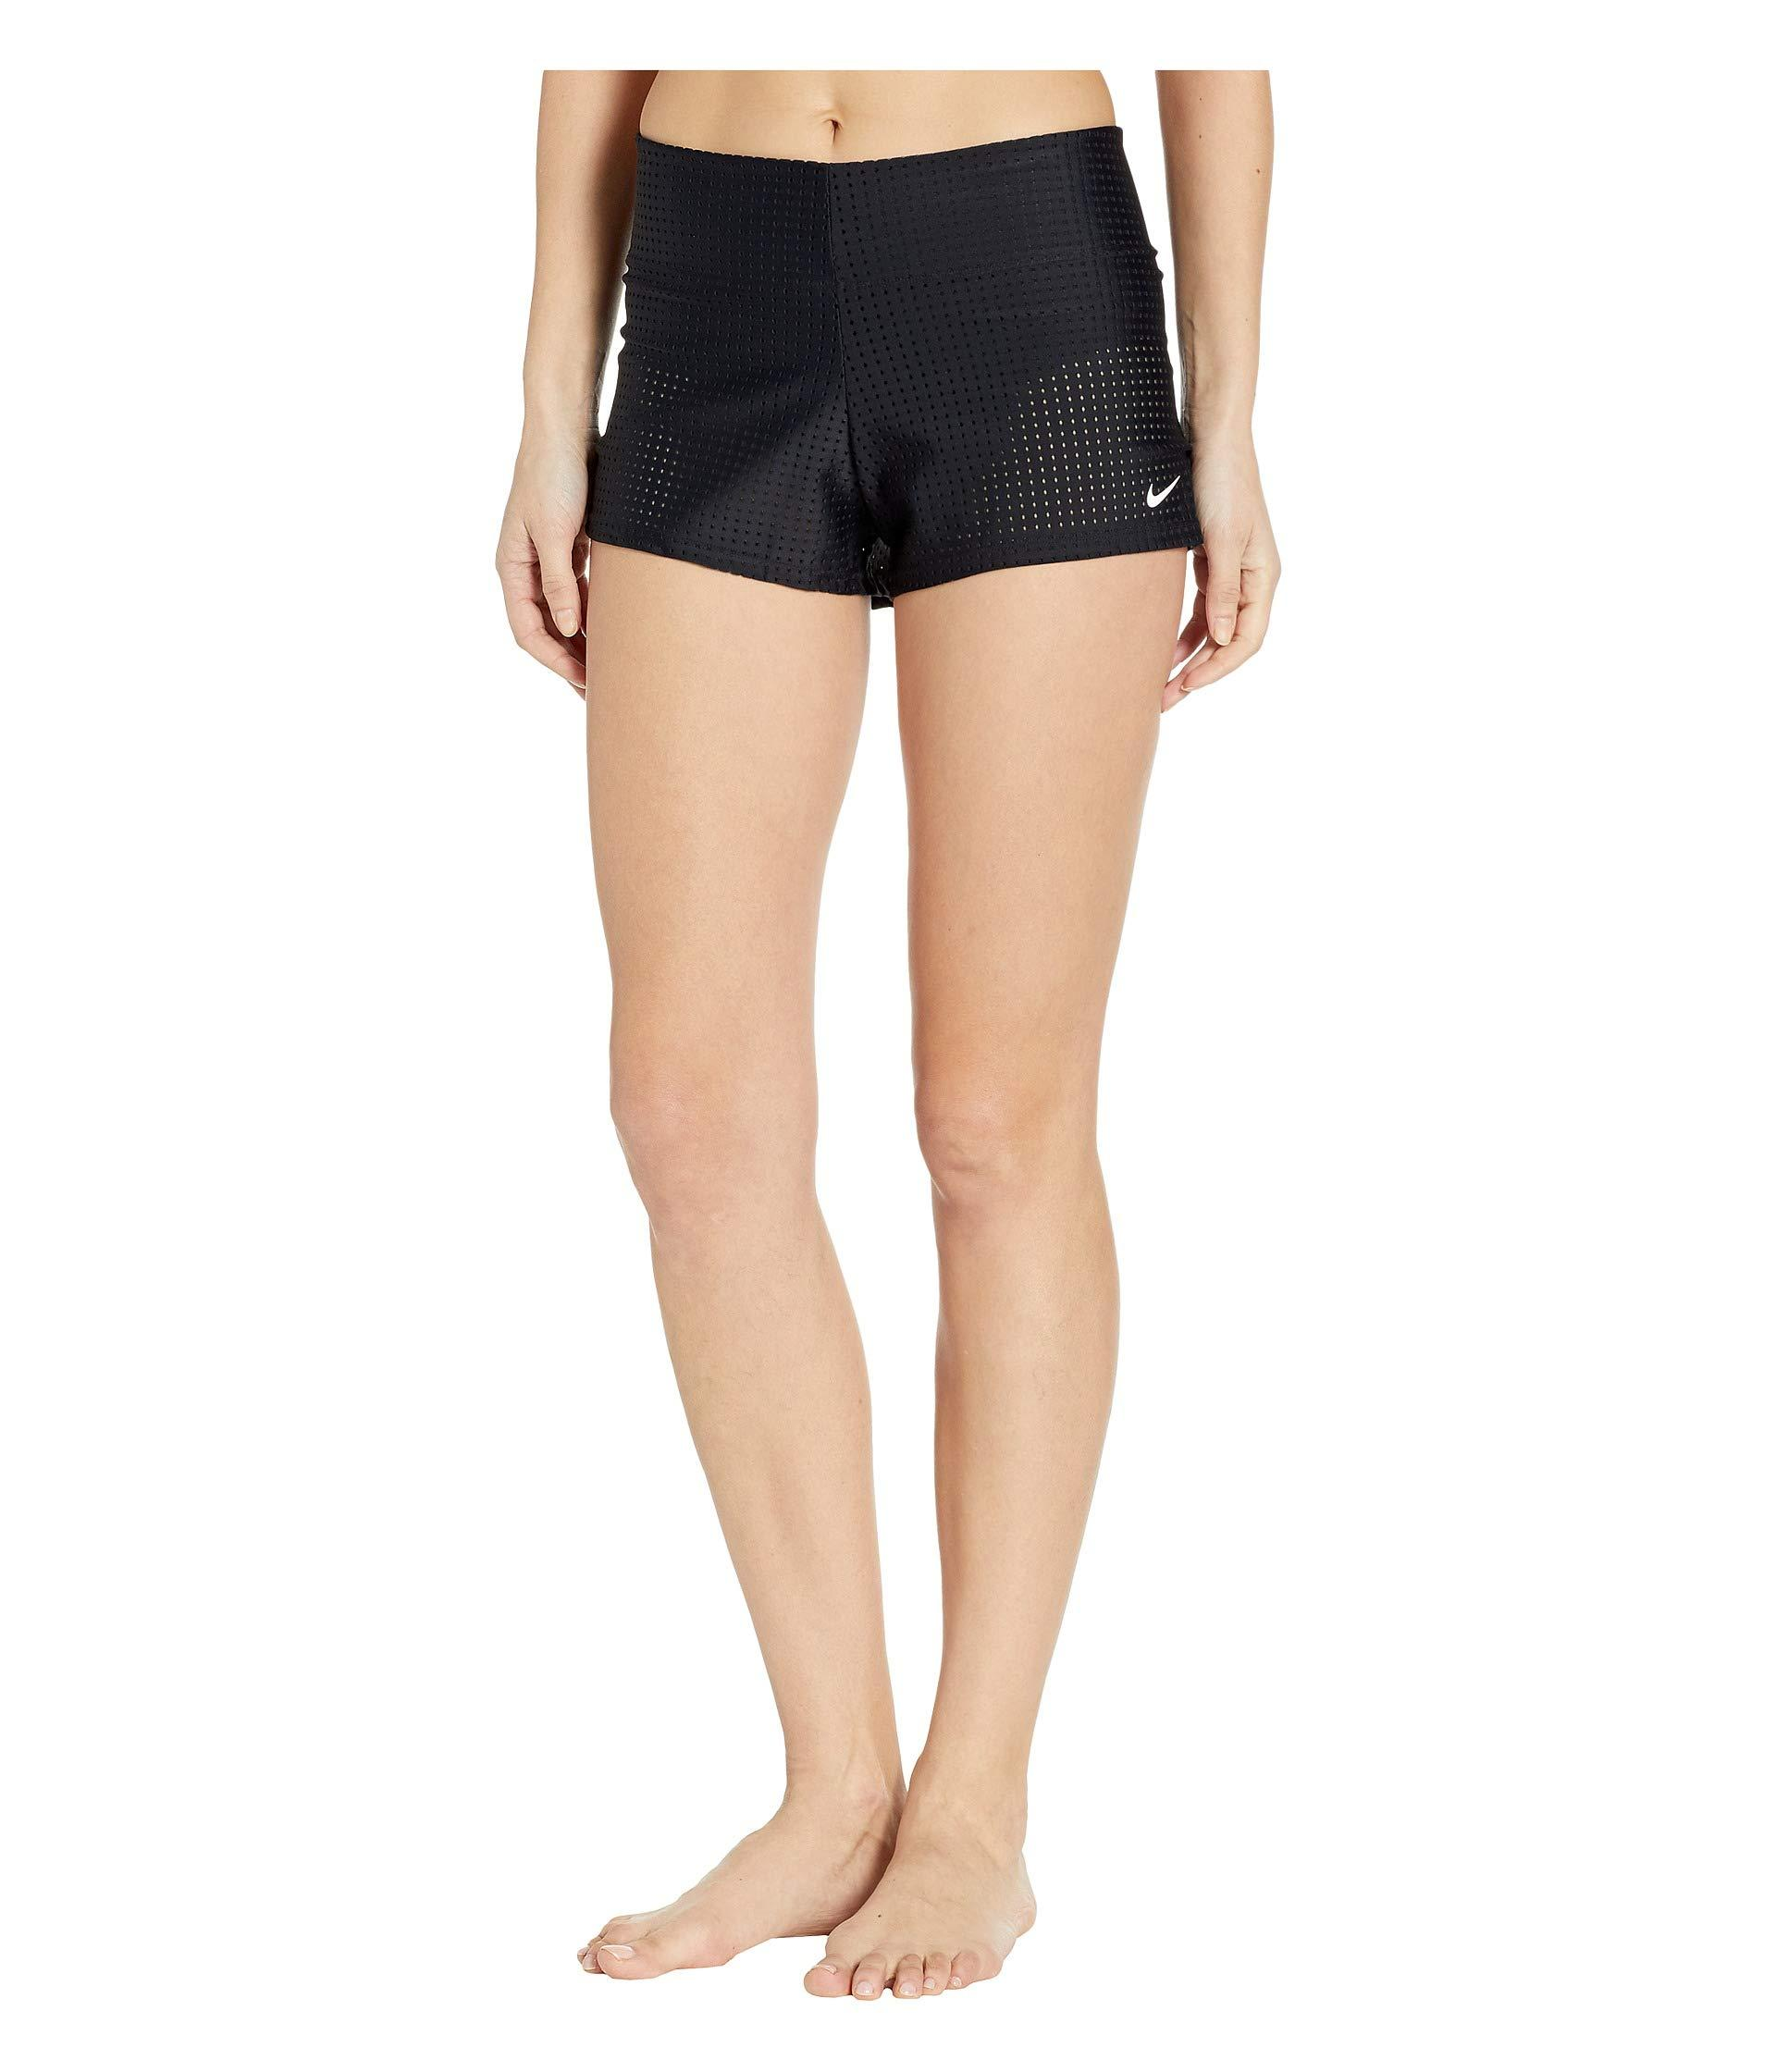 e6038b6802 Nike - Black Sport Mesh Swim Boardshorts - Lyst. View fullscreen